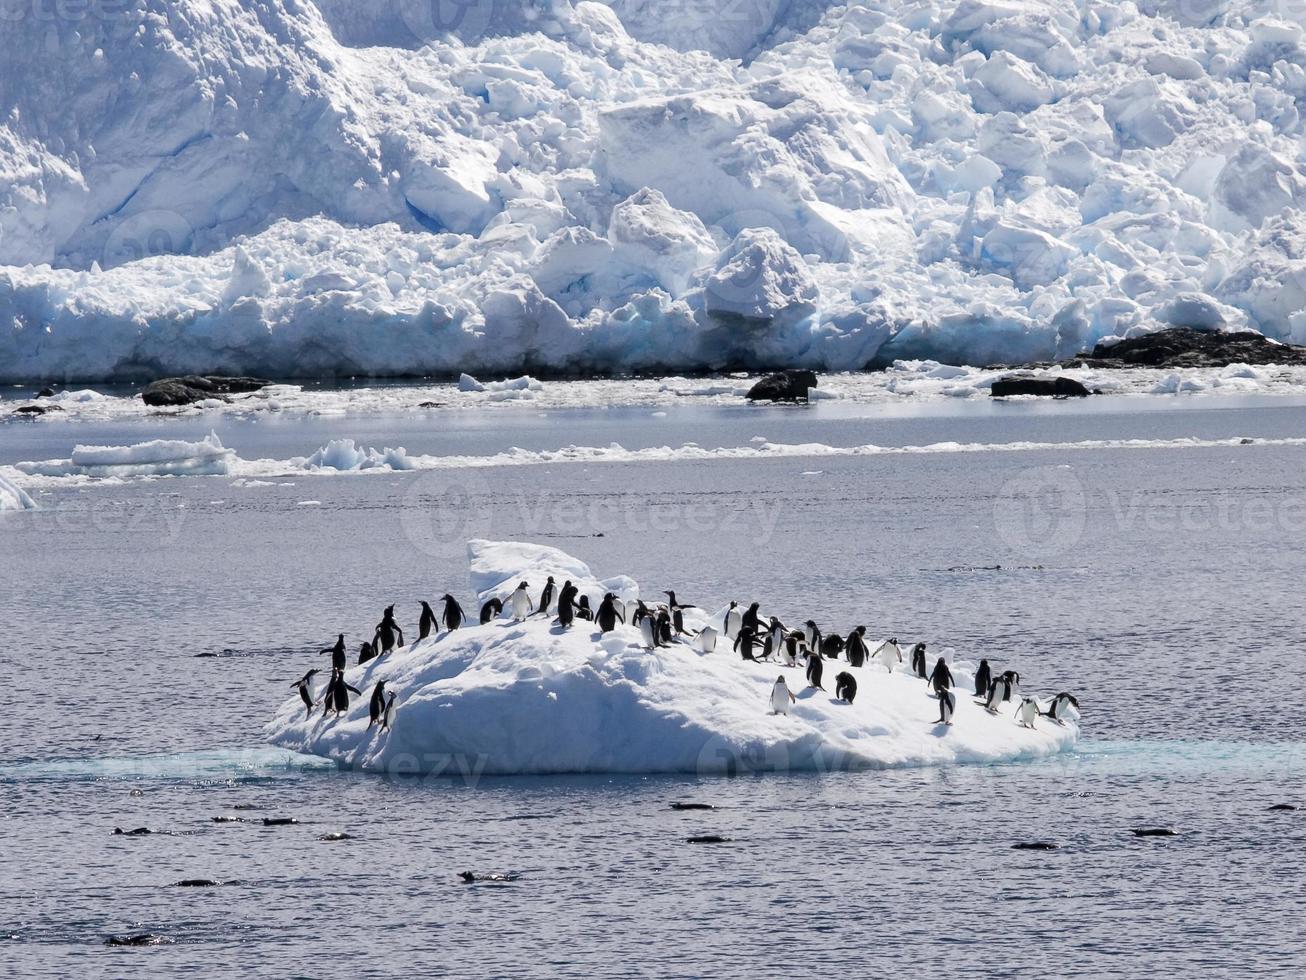 recreación de pingüinos foto